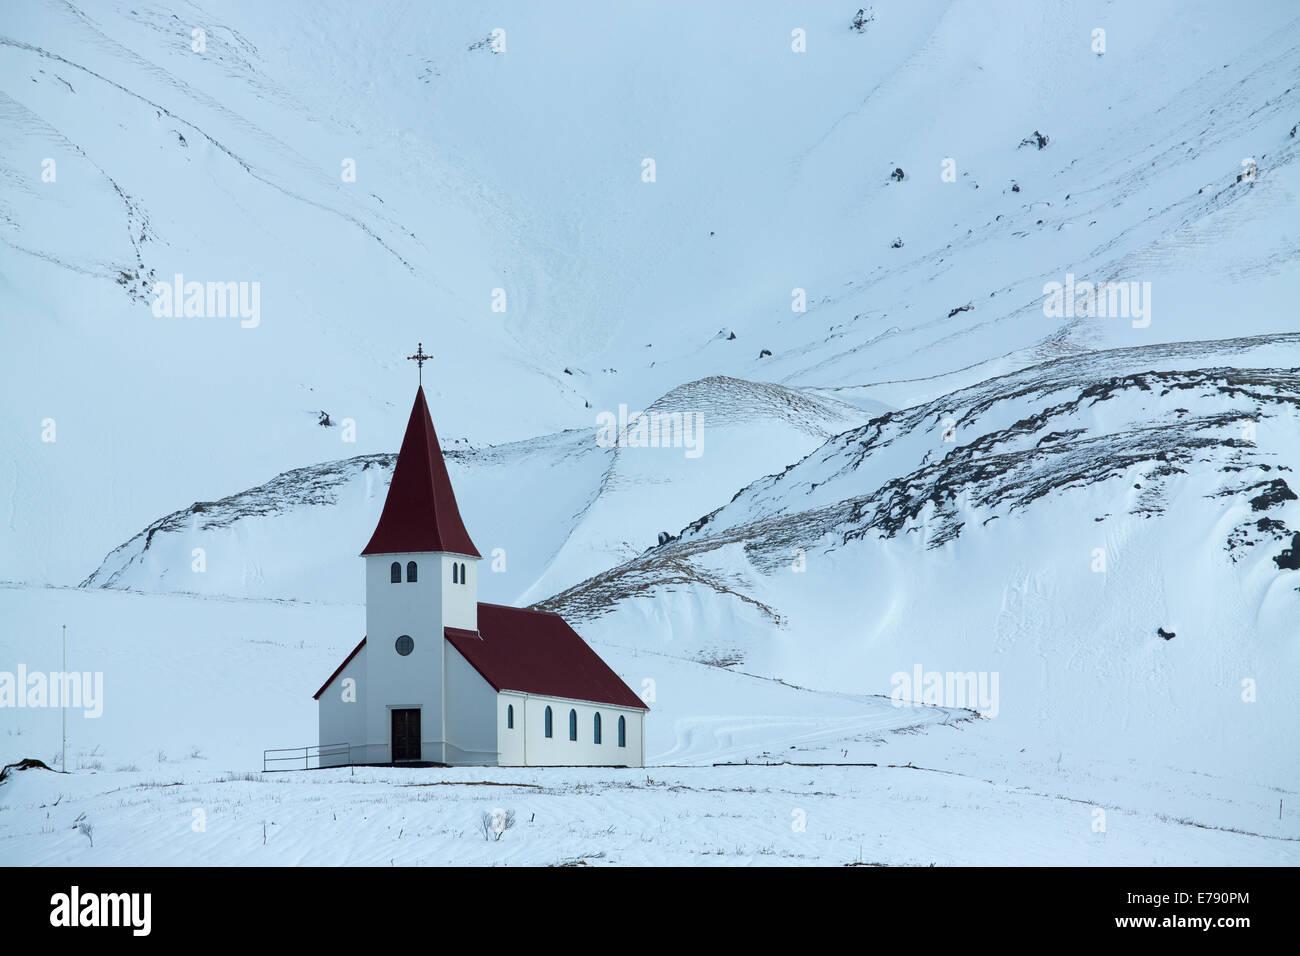 die Kirche oberhalb der Ortschaft Vík Í Mýrdal, Süden Islands Stockbild